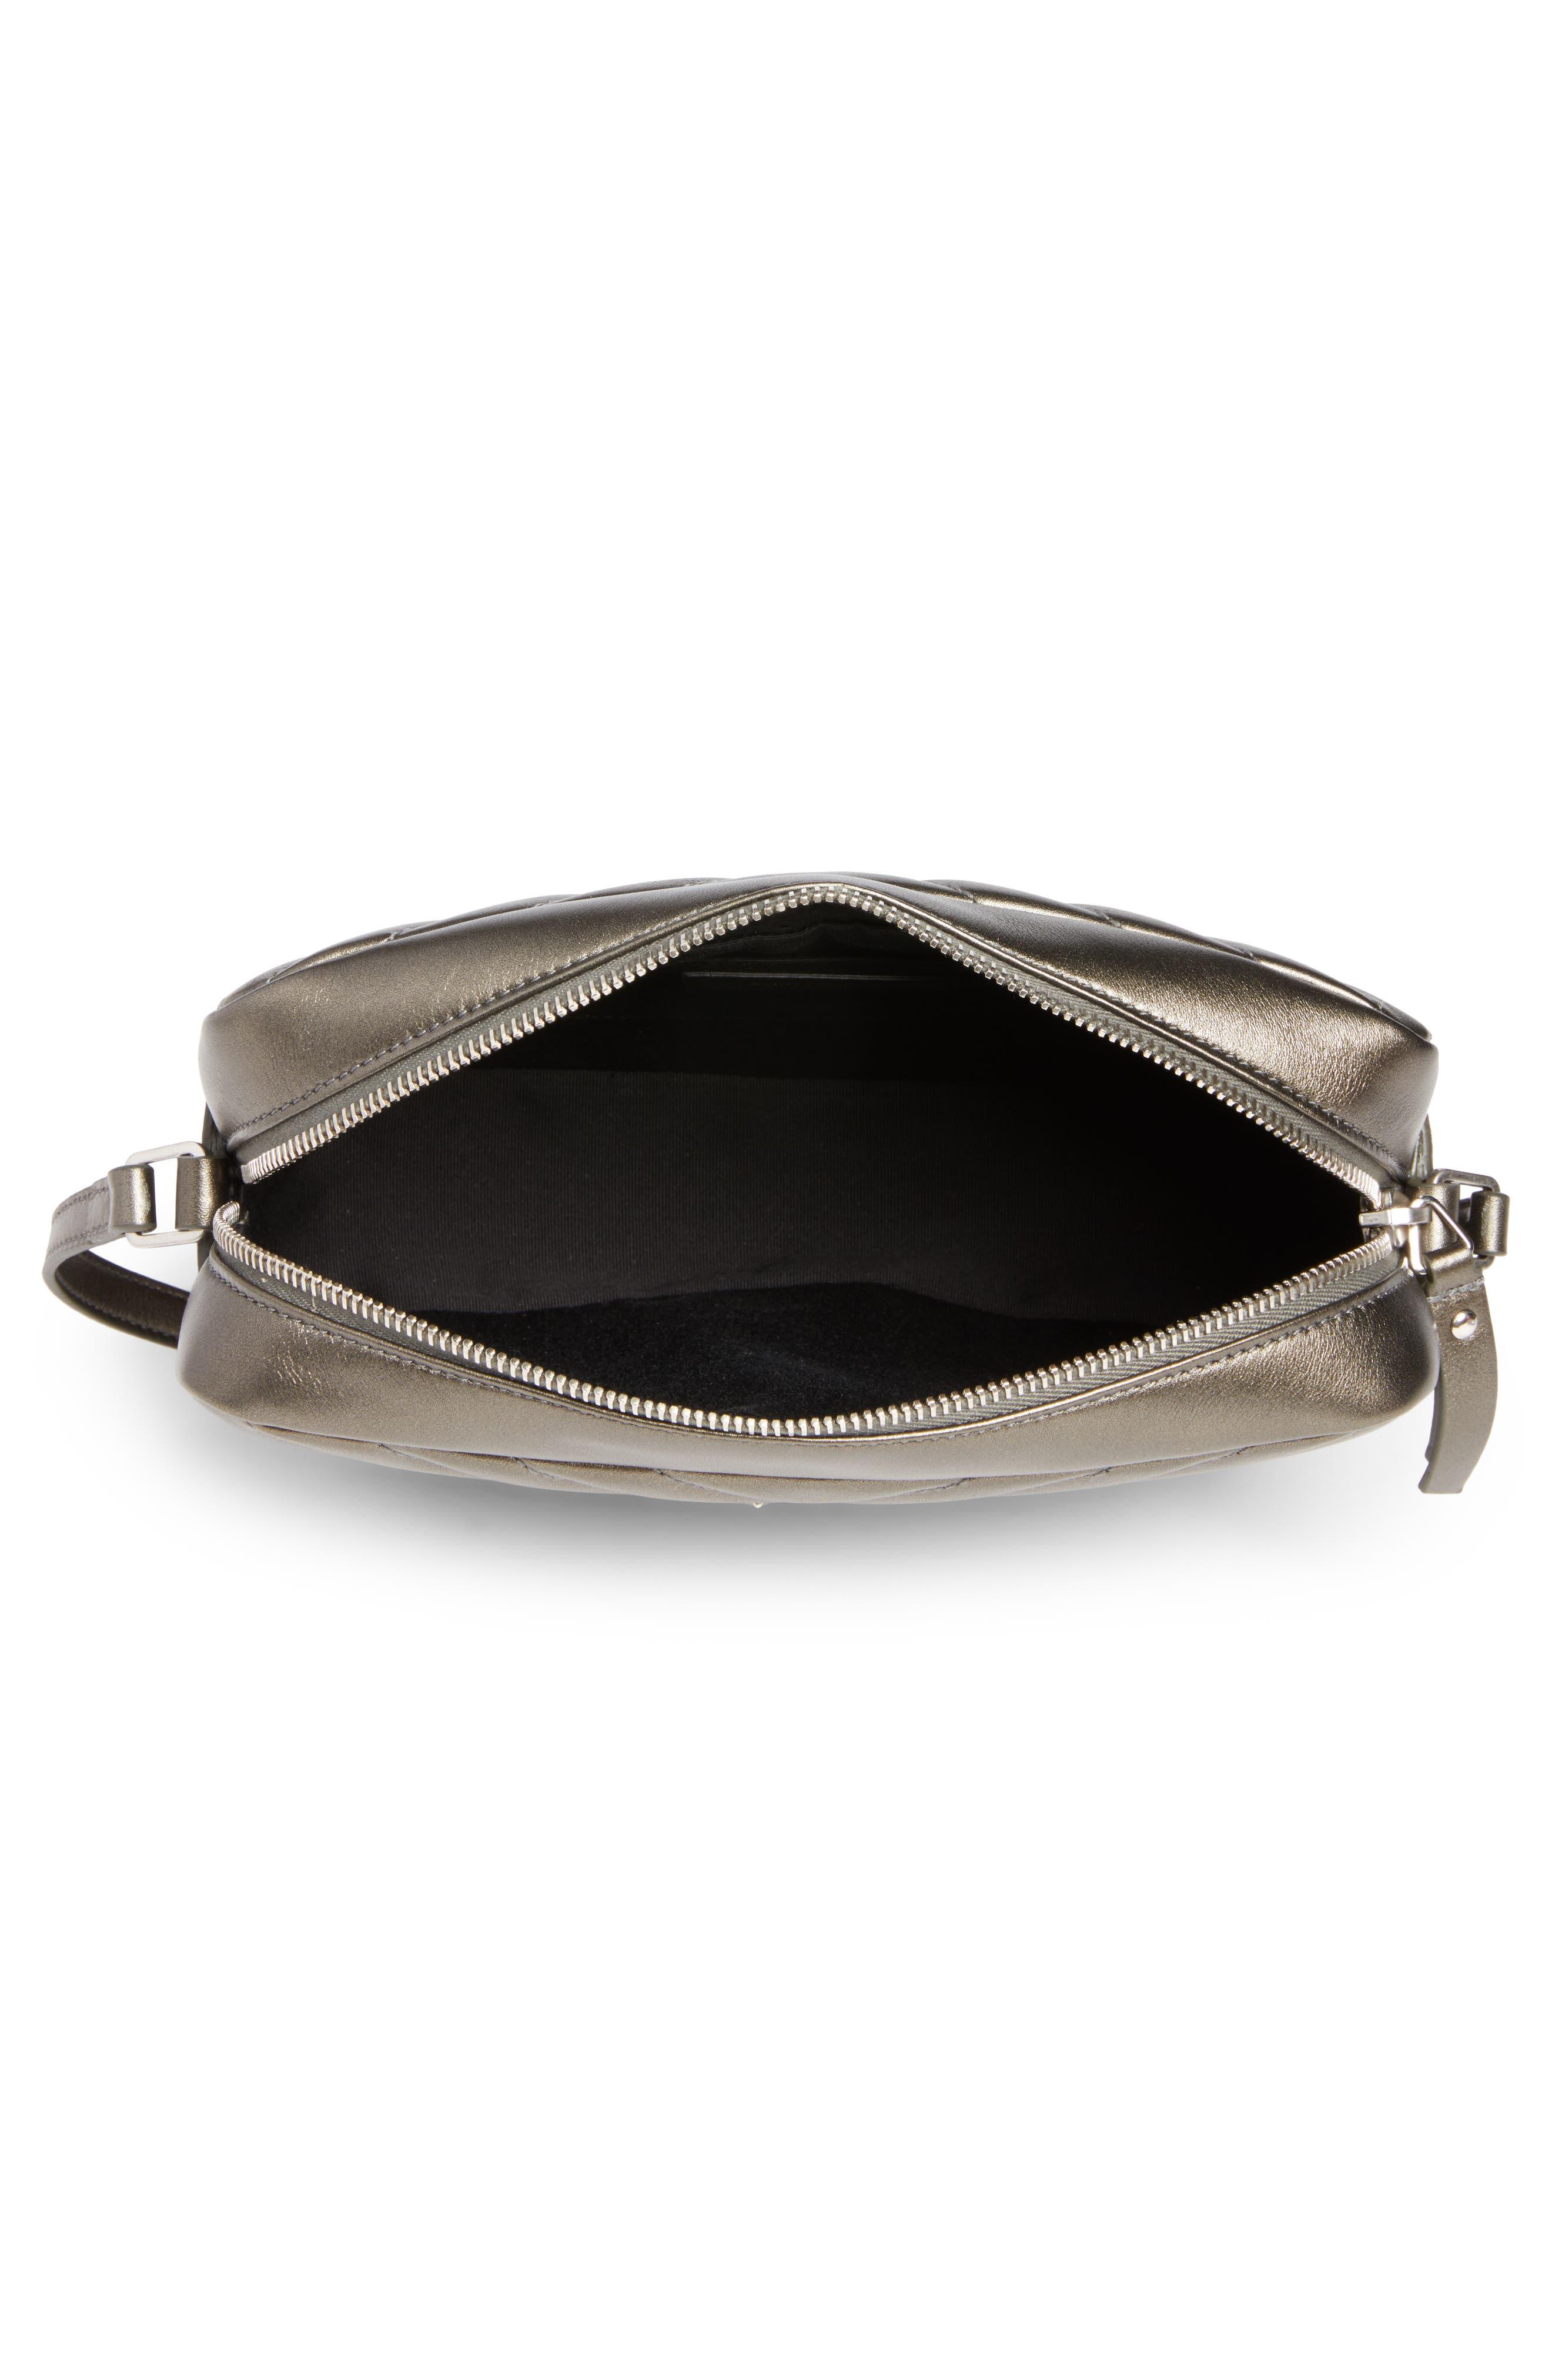 Medium Lou Calfskin Leather Camera Bag,                             Alternate thumbnail 4, color,                             020